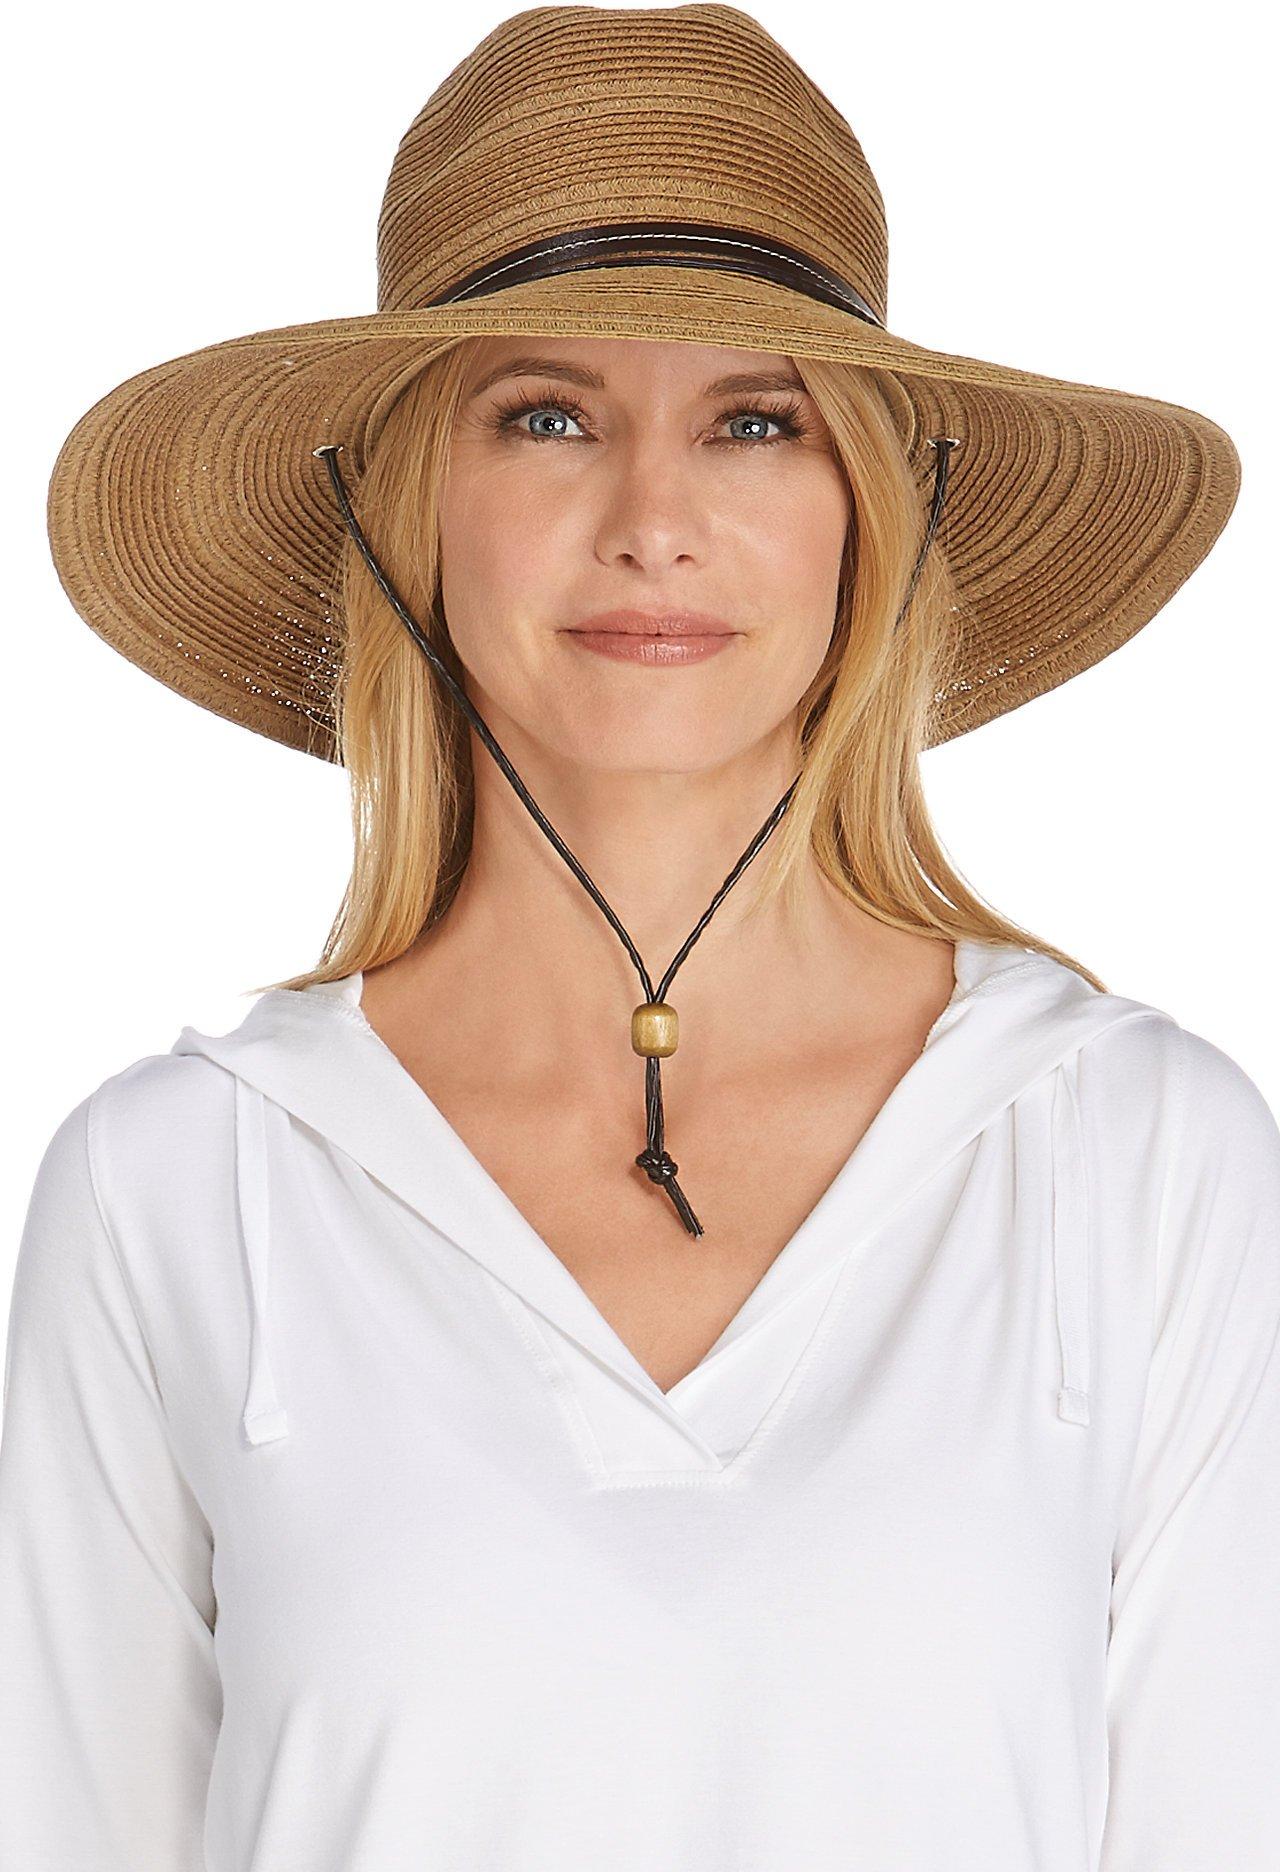 Coolibar UPF 50+ Women's Tempe Sun Hat - Sun Protective (One Size- Brown/Natural)